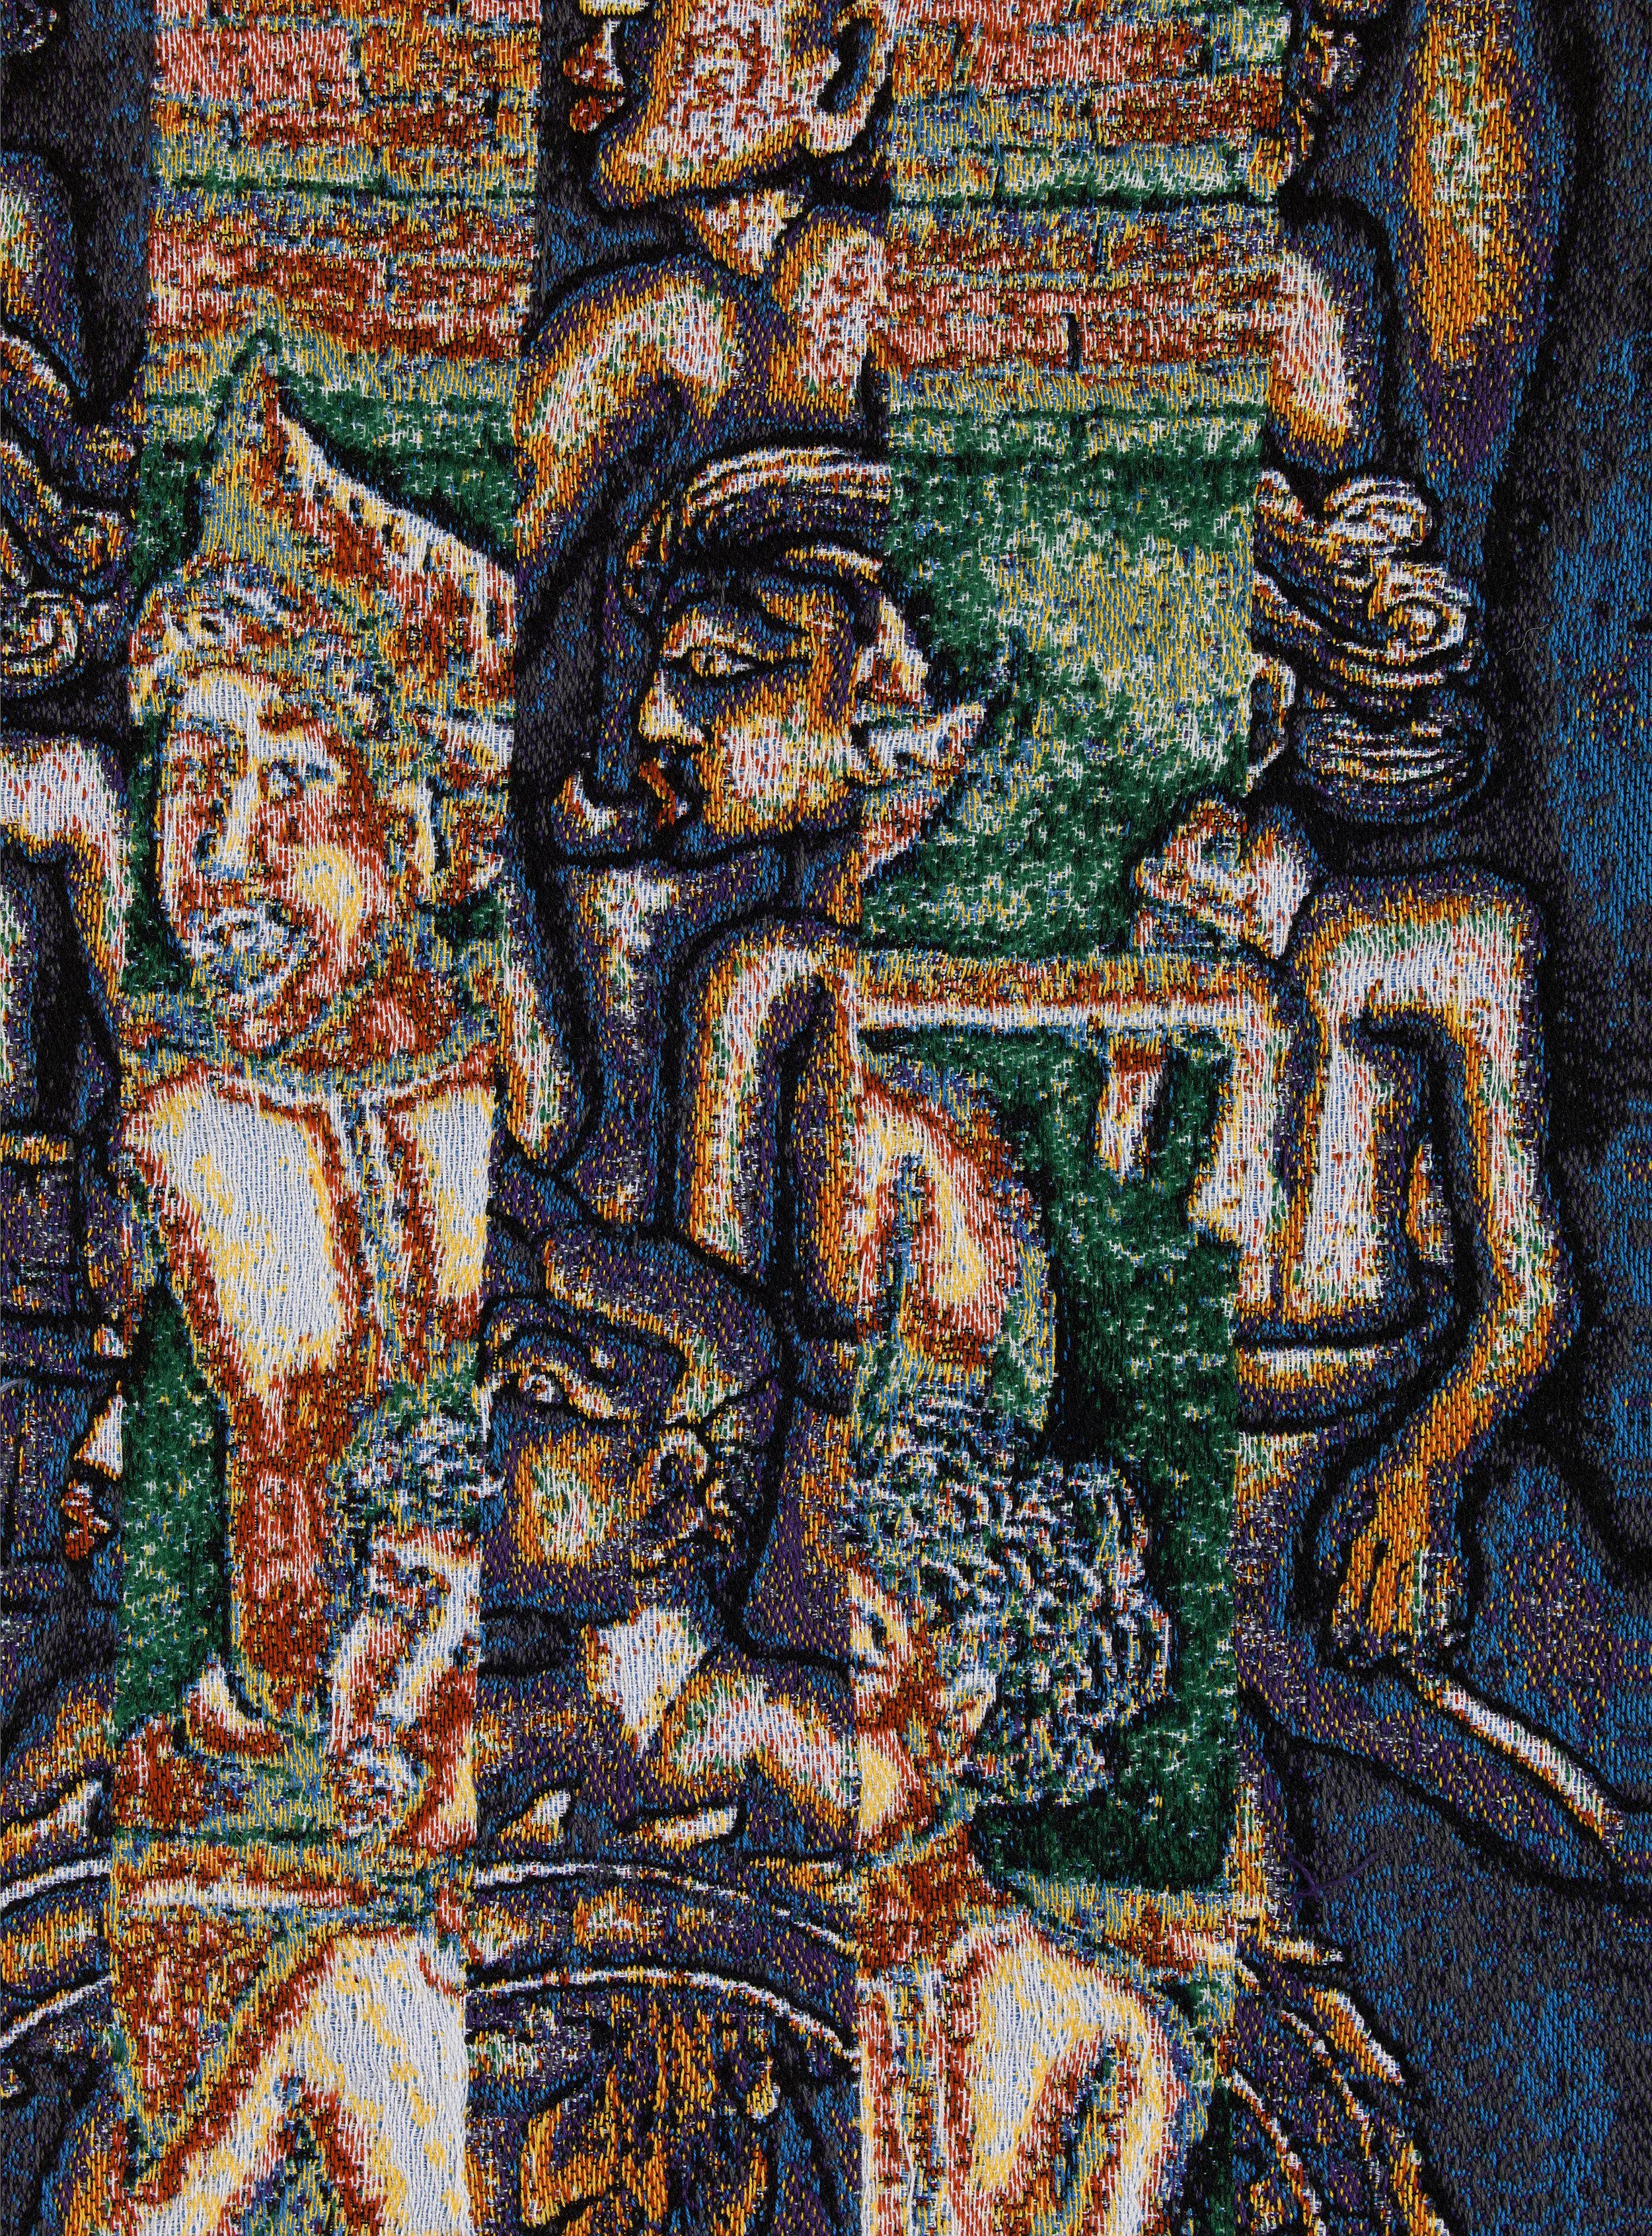 Batuan, jacquard woven, detail